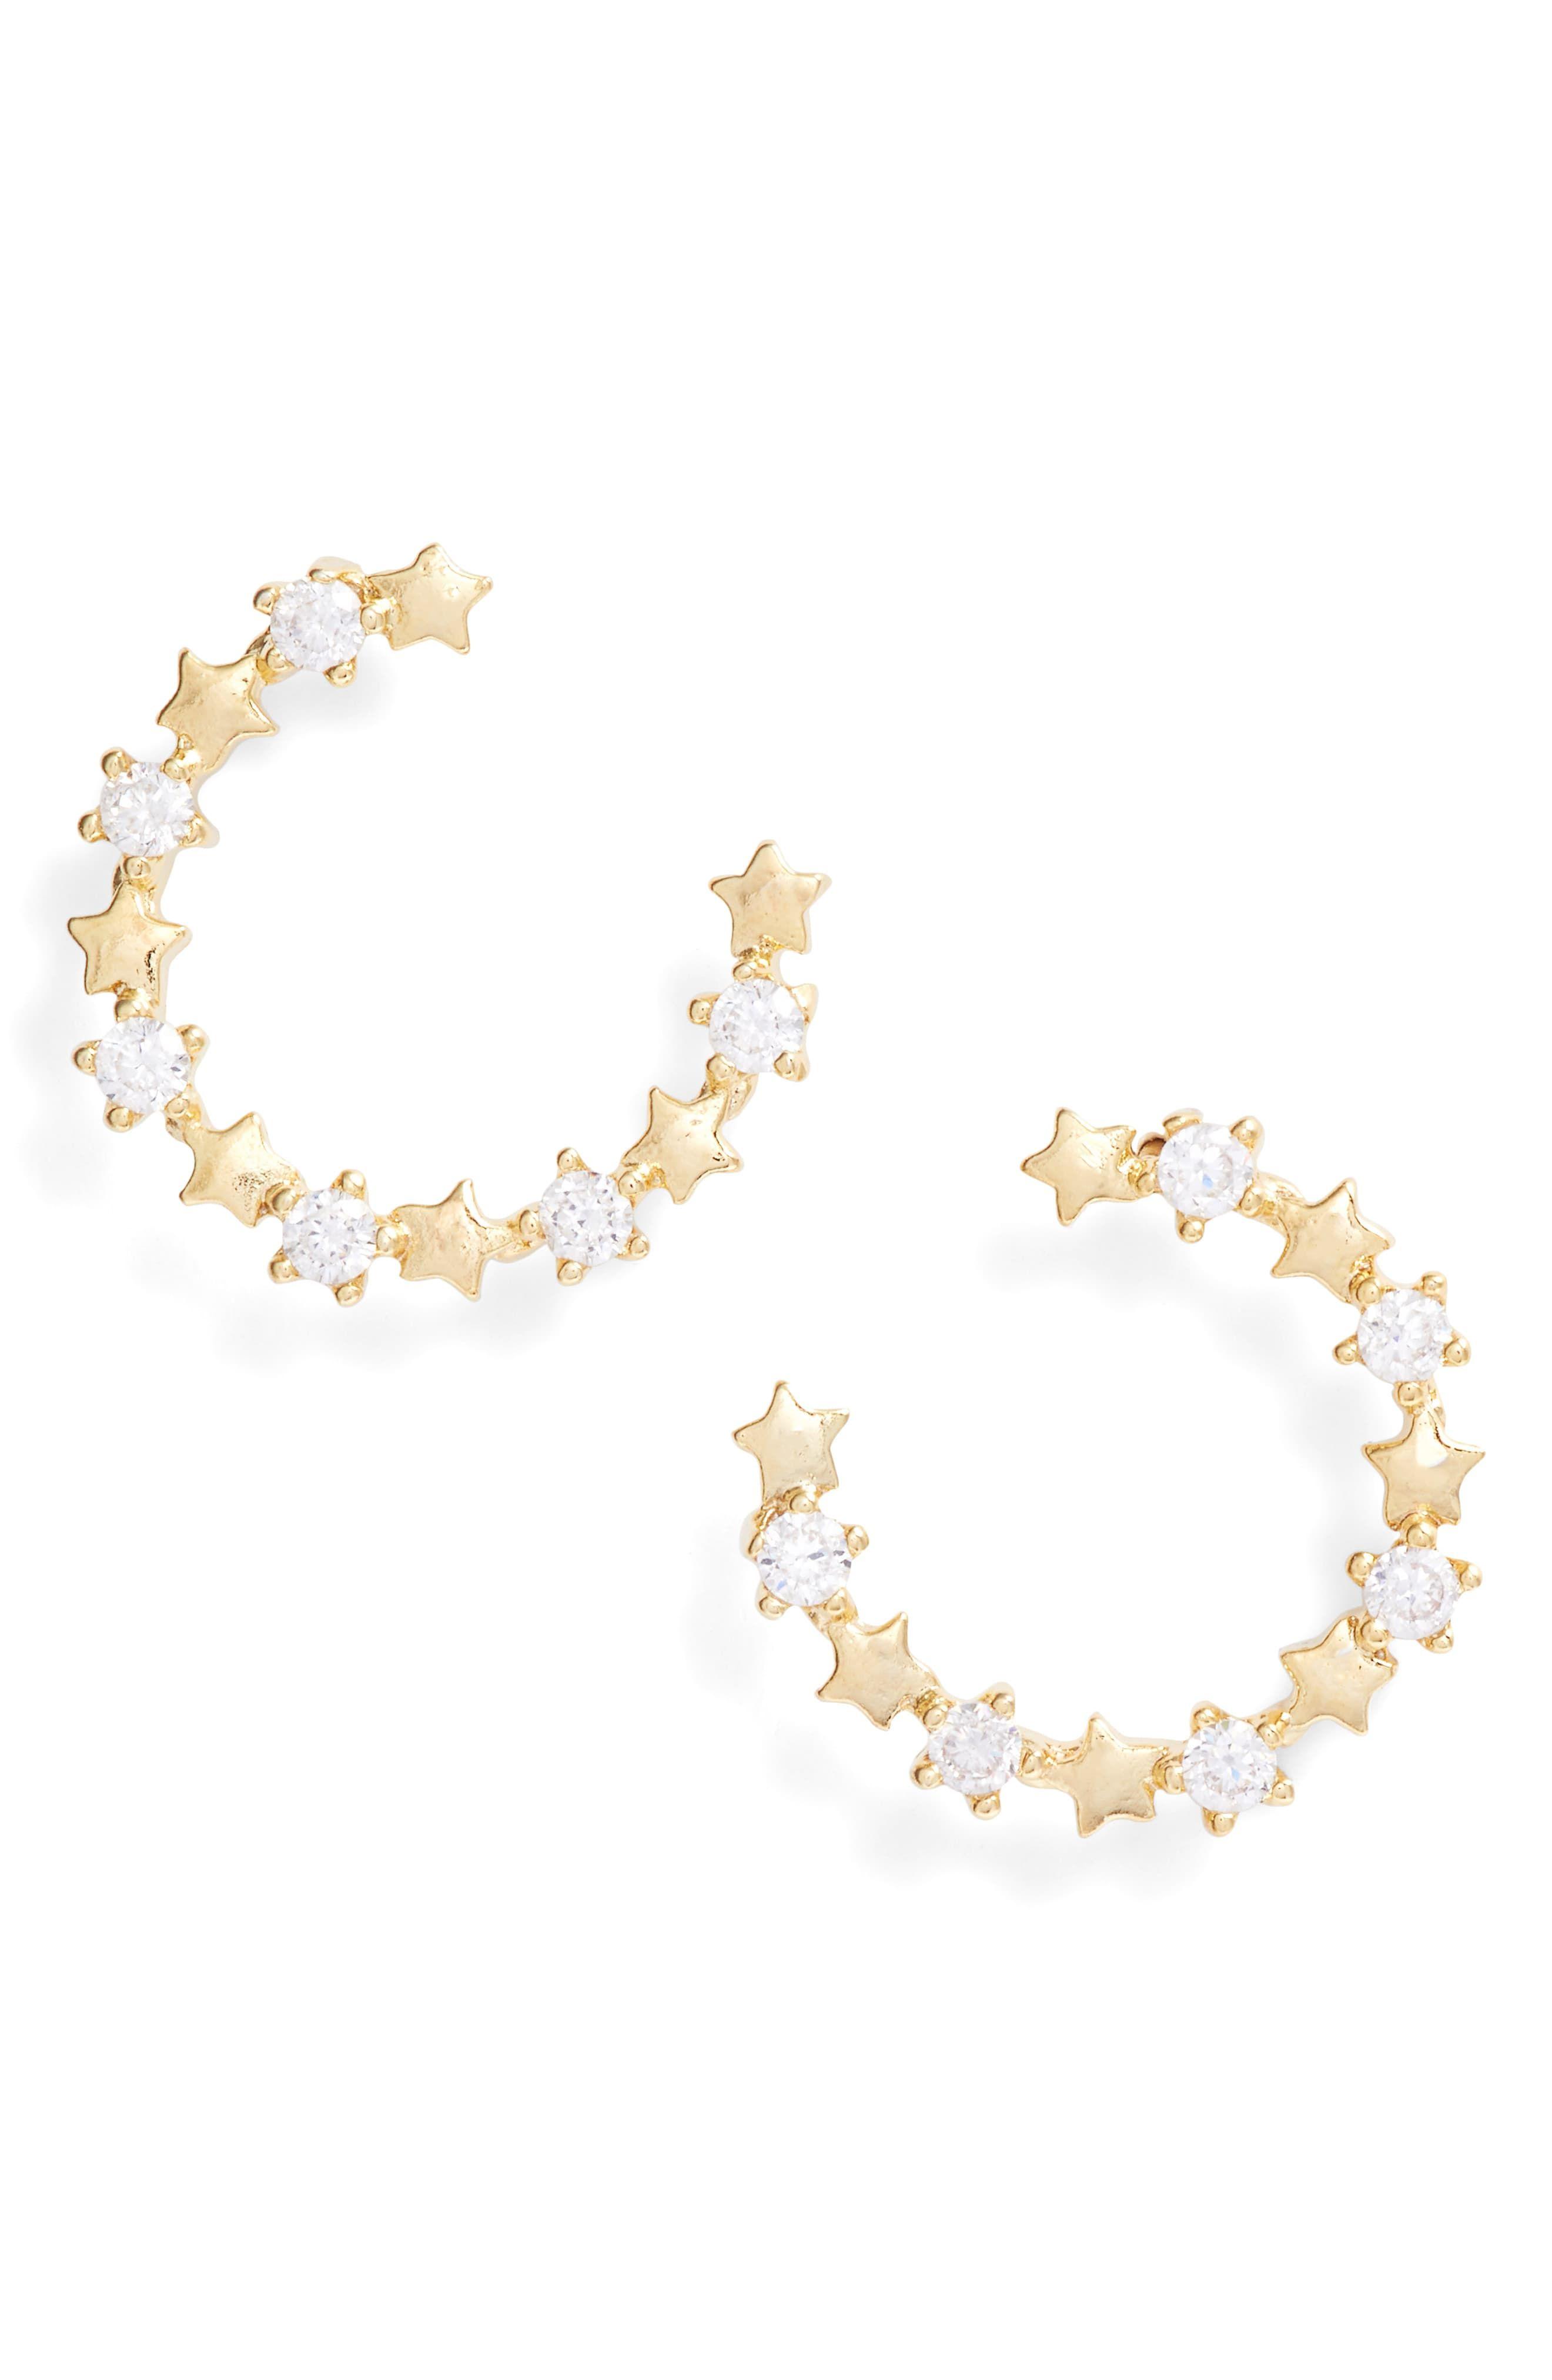 826f7ef77bef04 Women's Bracha Wishful Hoop Earrings | Products in 2019 | Hoop ...